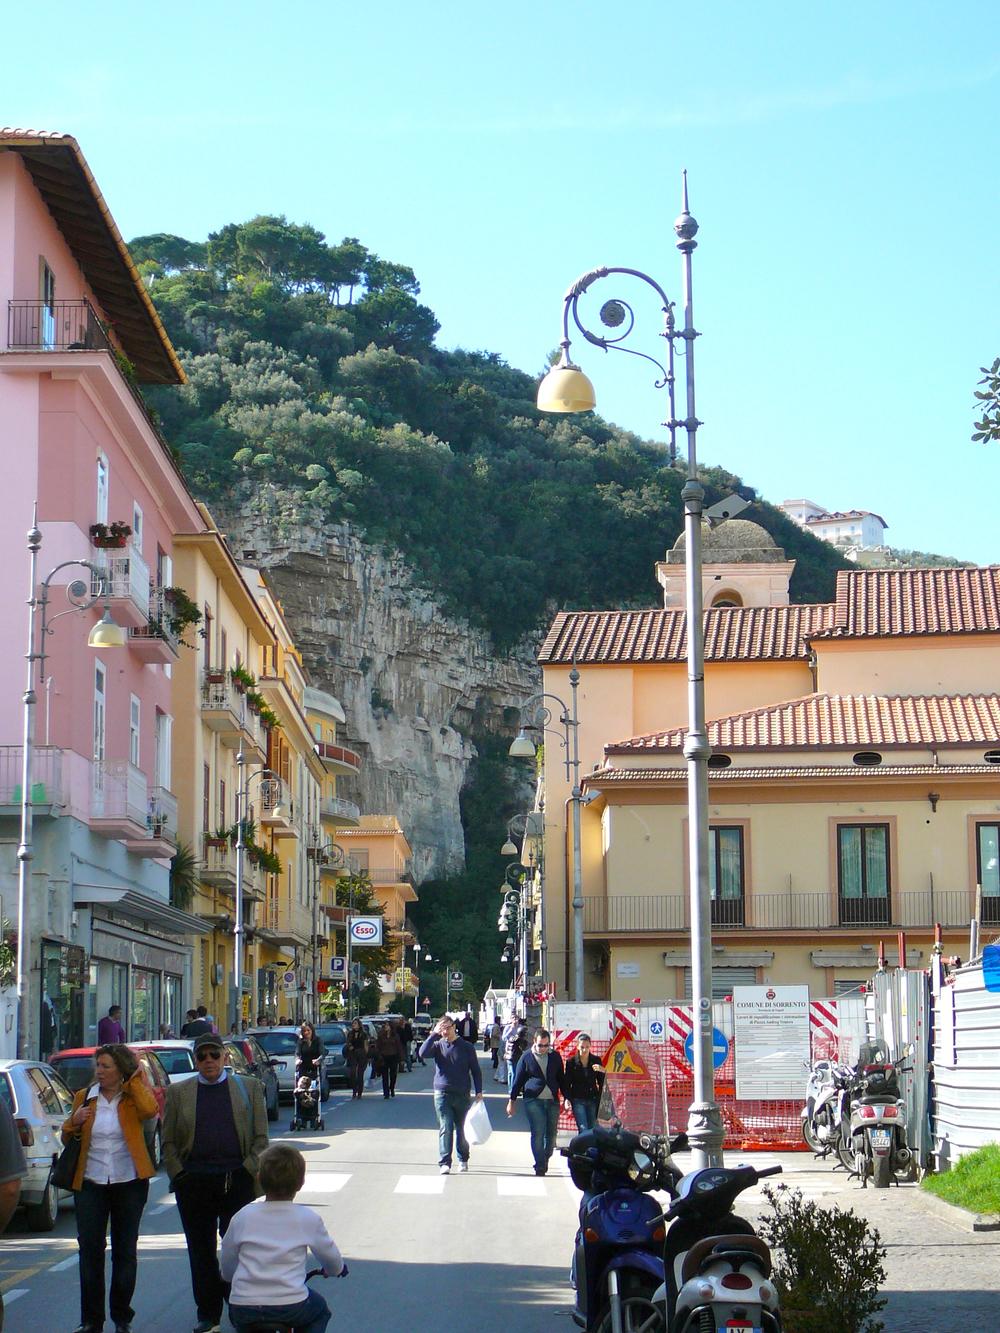 CRO Italy web 2009 - 07.jpg